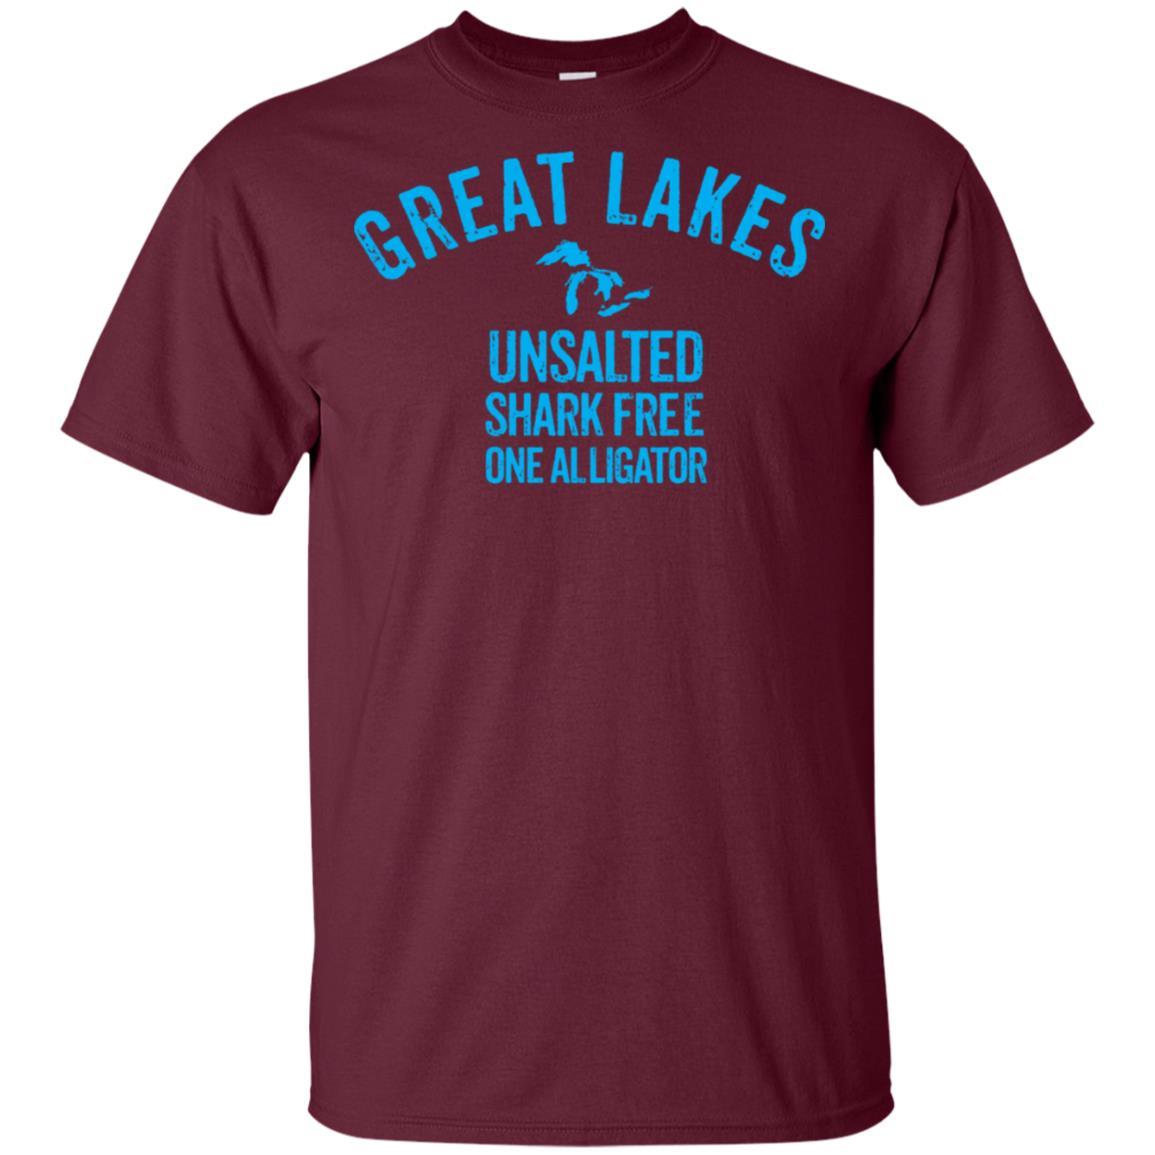 Great Lakes Unsalted Shark Free One Alligator Unisex Short Sleeve